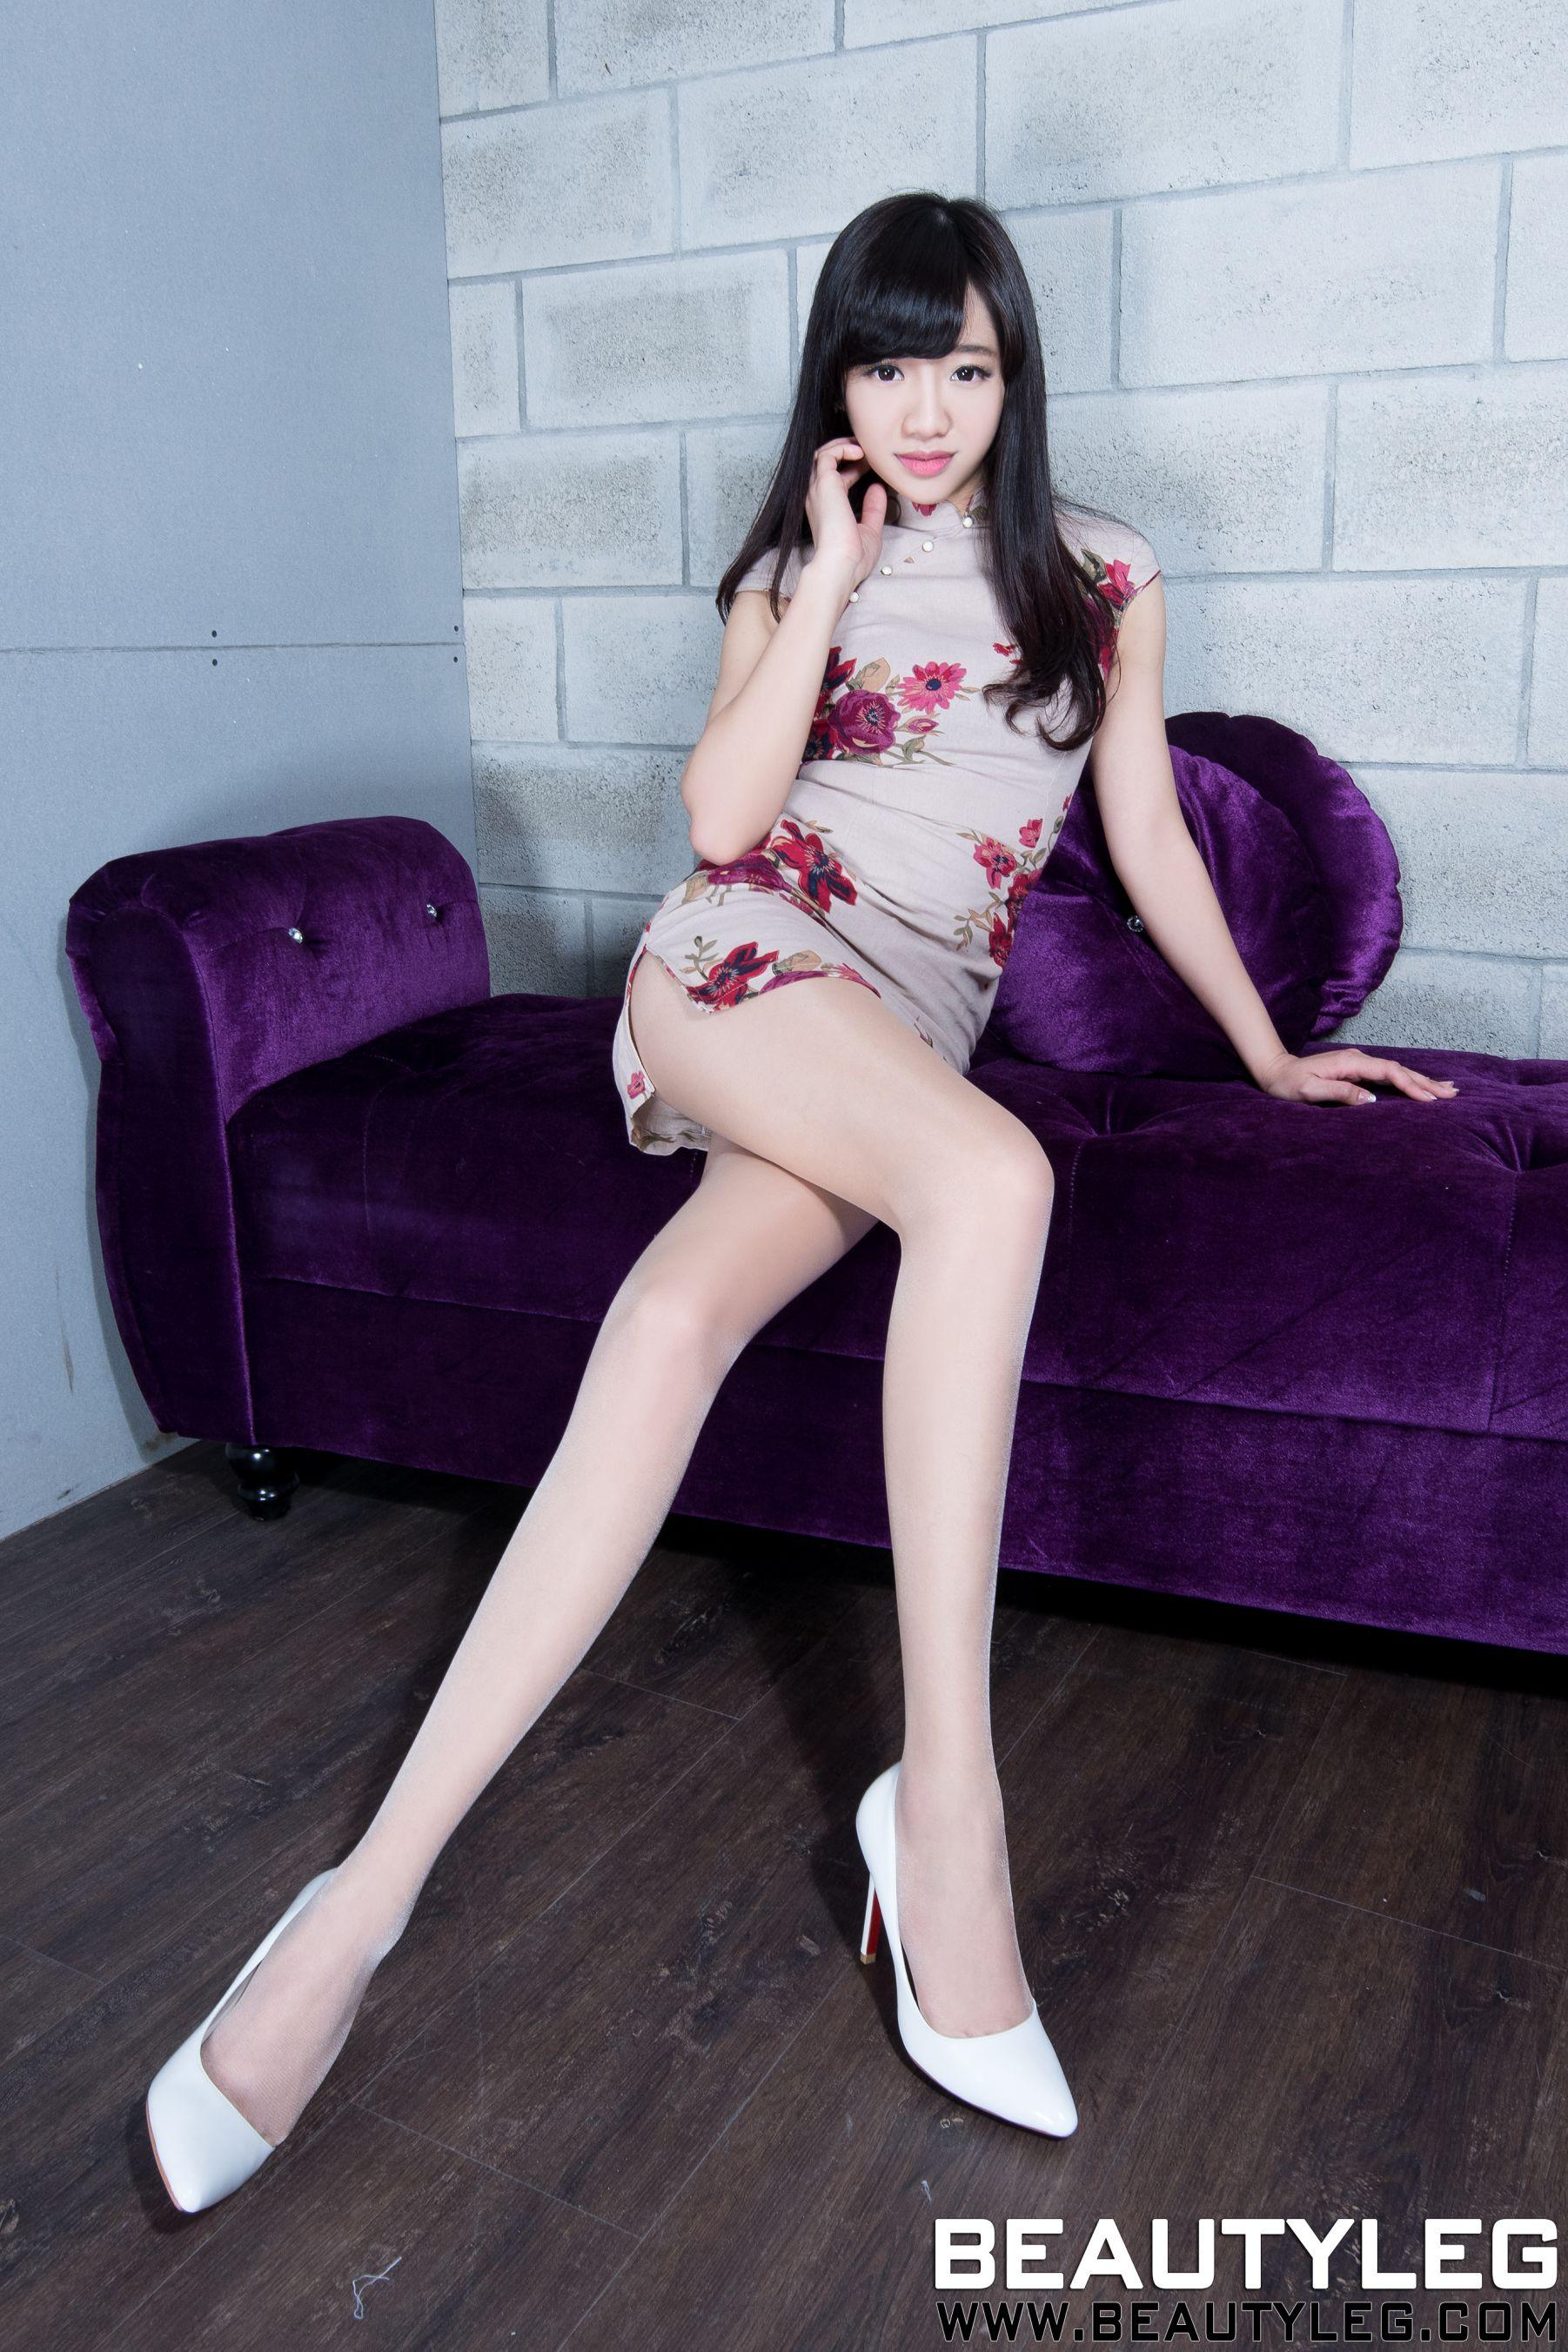 VOL.1203 [Beautyleg]美腿旗袍:欣洁(腿模Celia)超高清个人性感漂亮大图(69P)